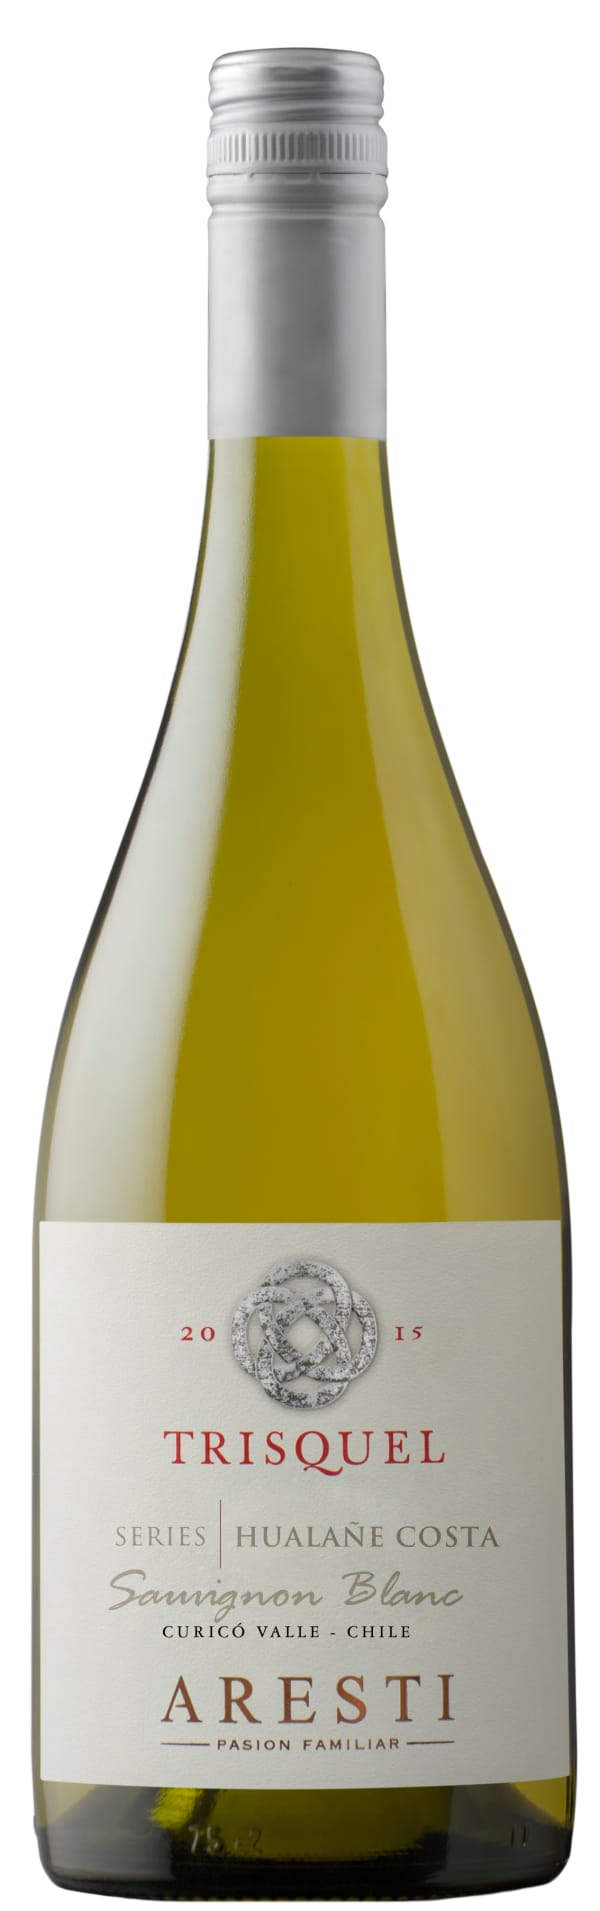 Trisquel Hualañe Costa Sauvignon Blanc 2015